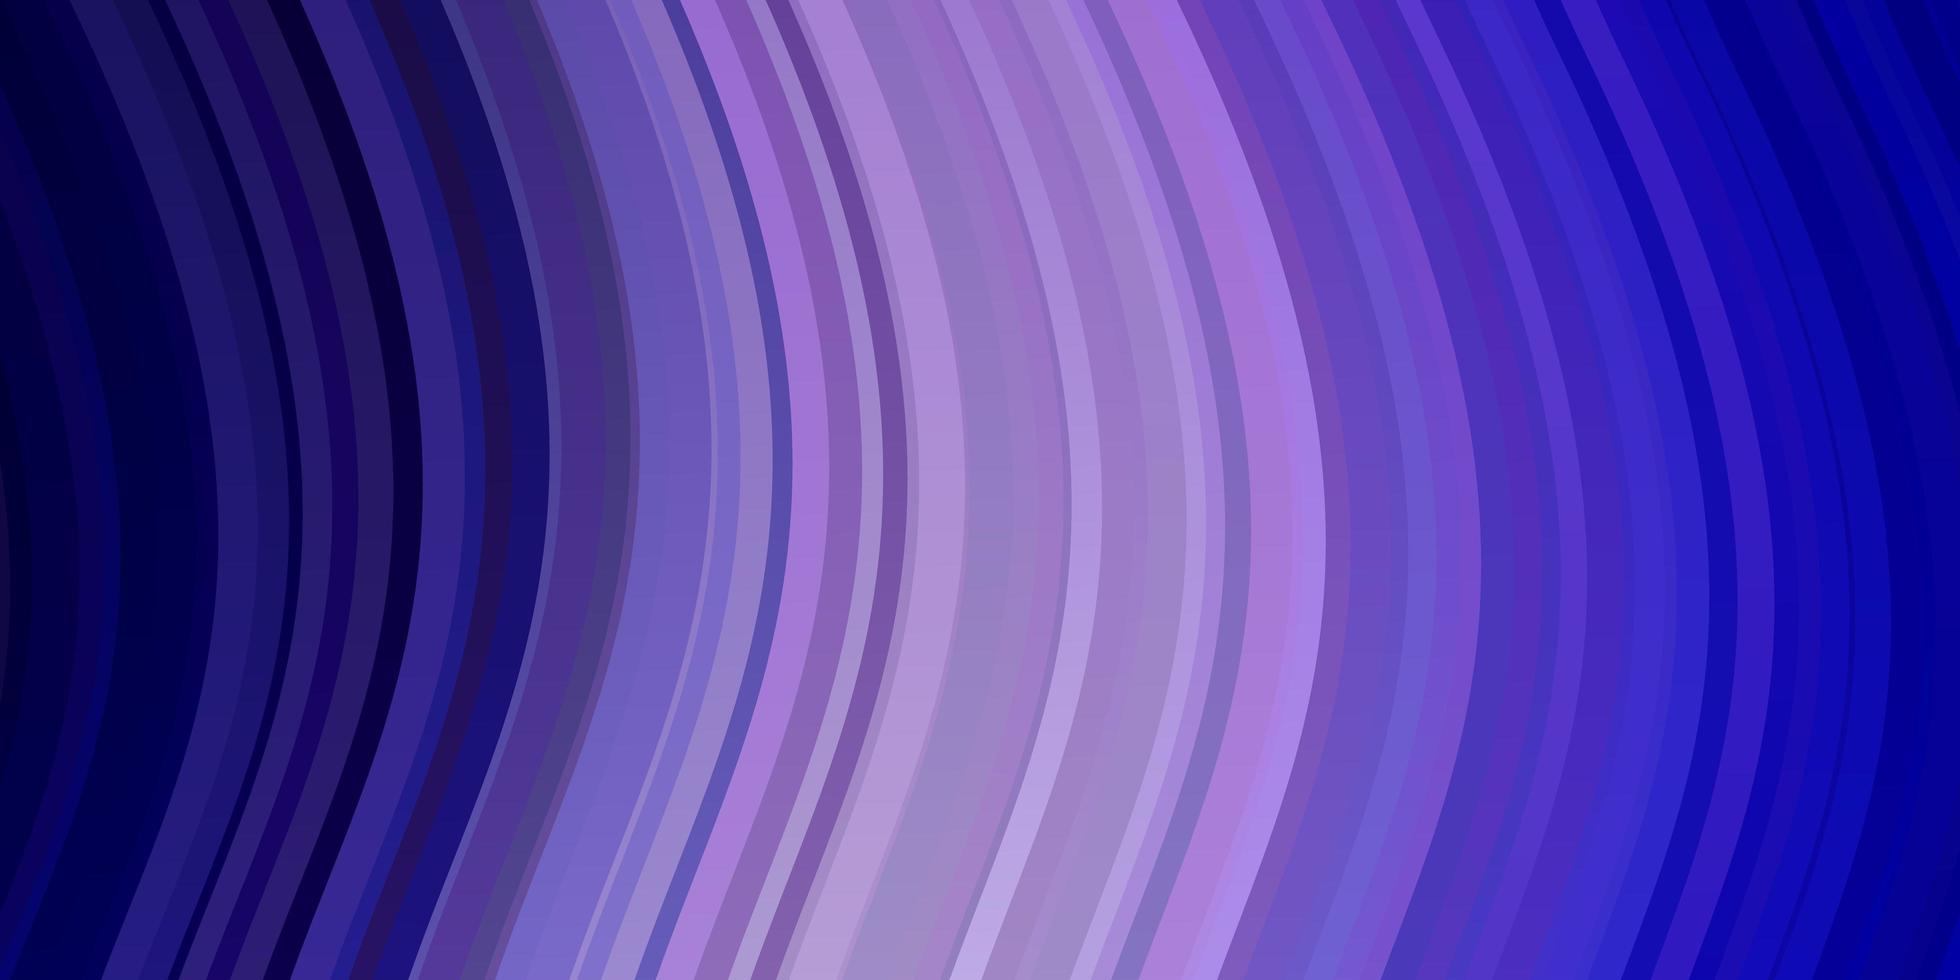 fundo vector rosa claro, azul com arcos.